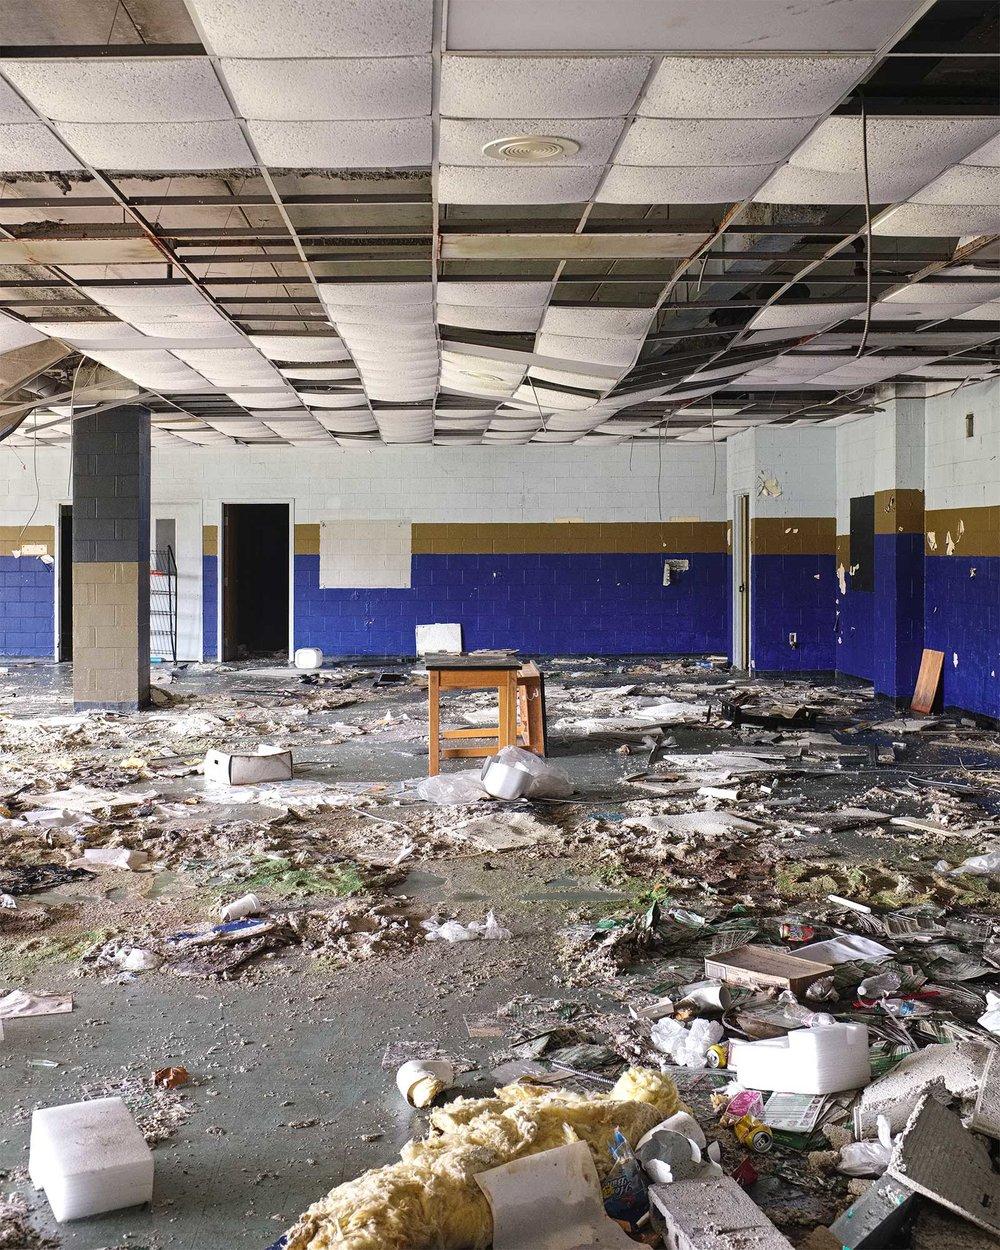 detroit-RosaParksSchool-002_w.jpg